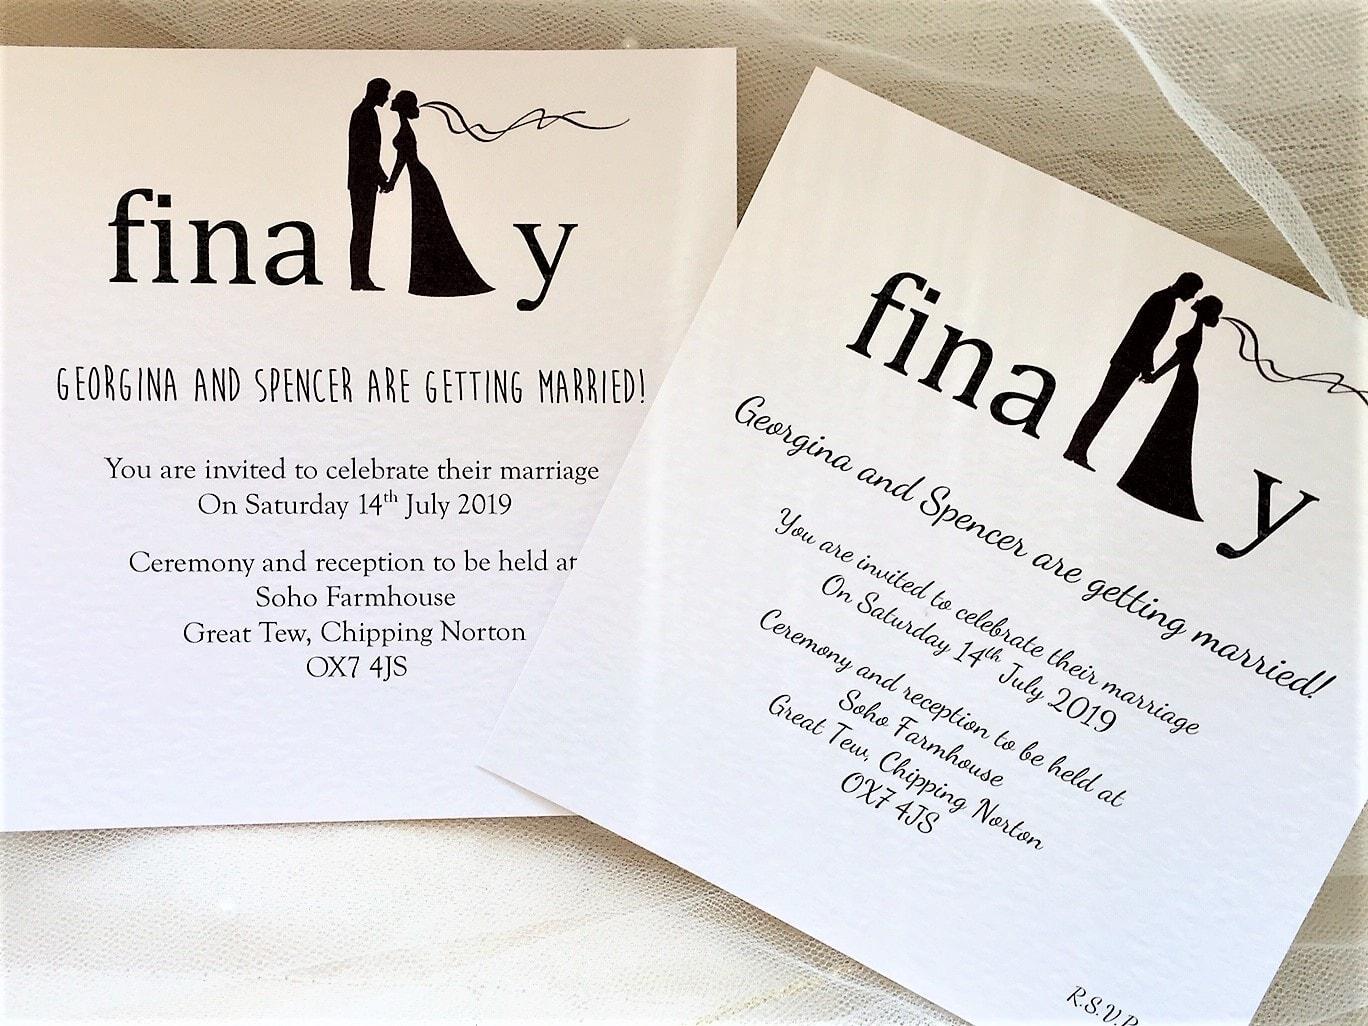 Modern Wedding Invites Uk: Finally Wedding Invitations £1.10 Each